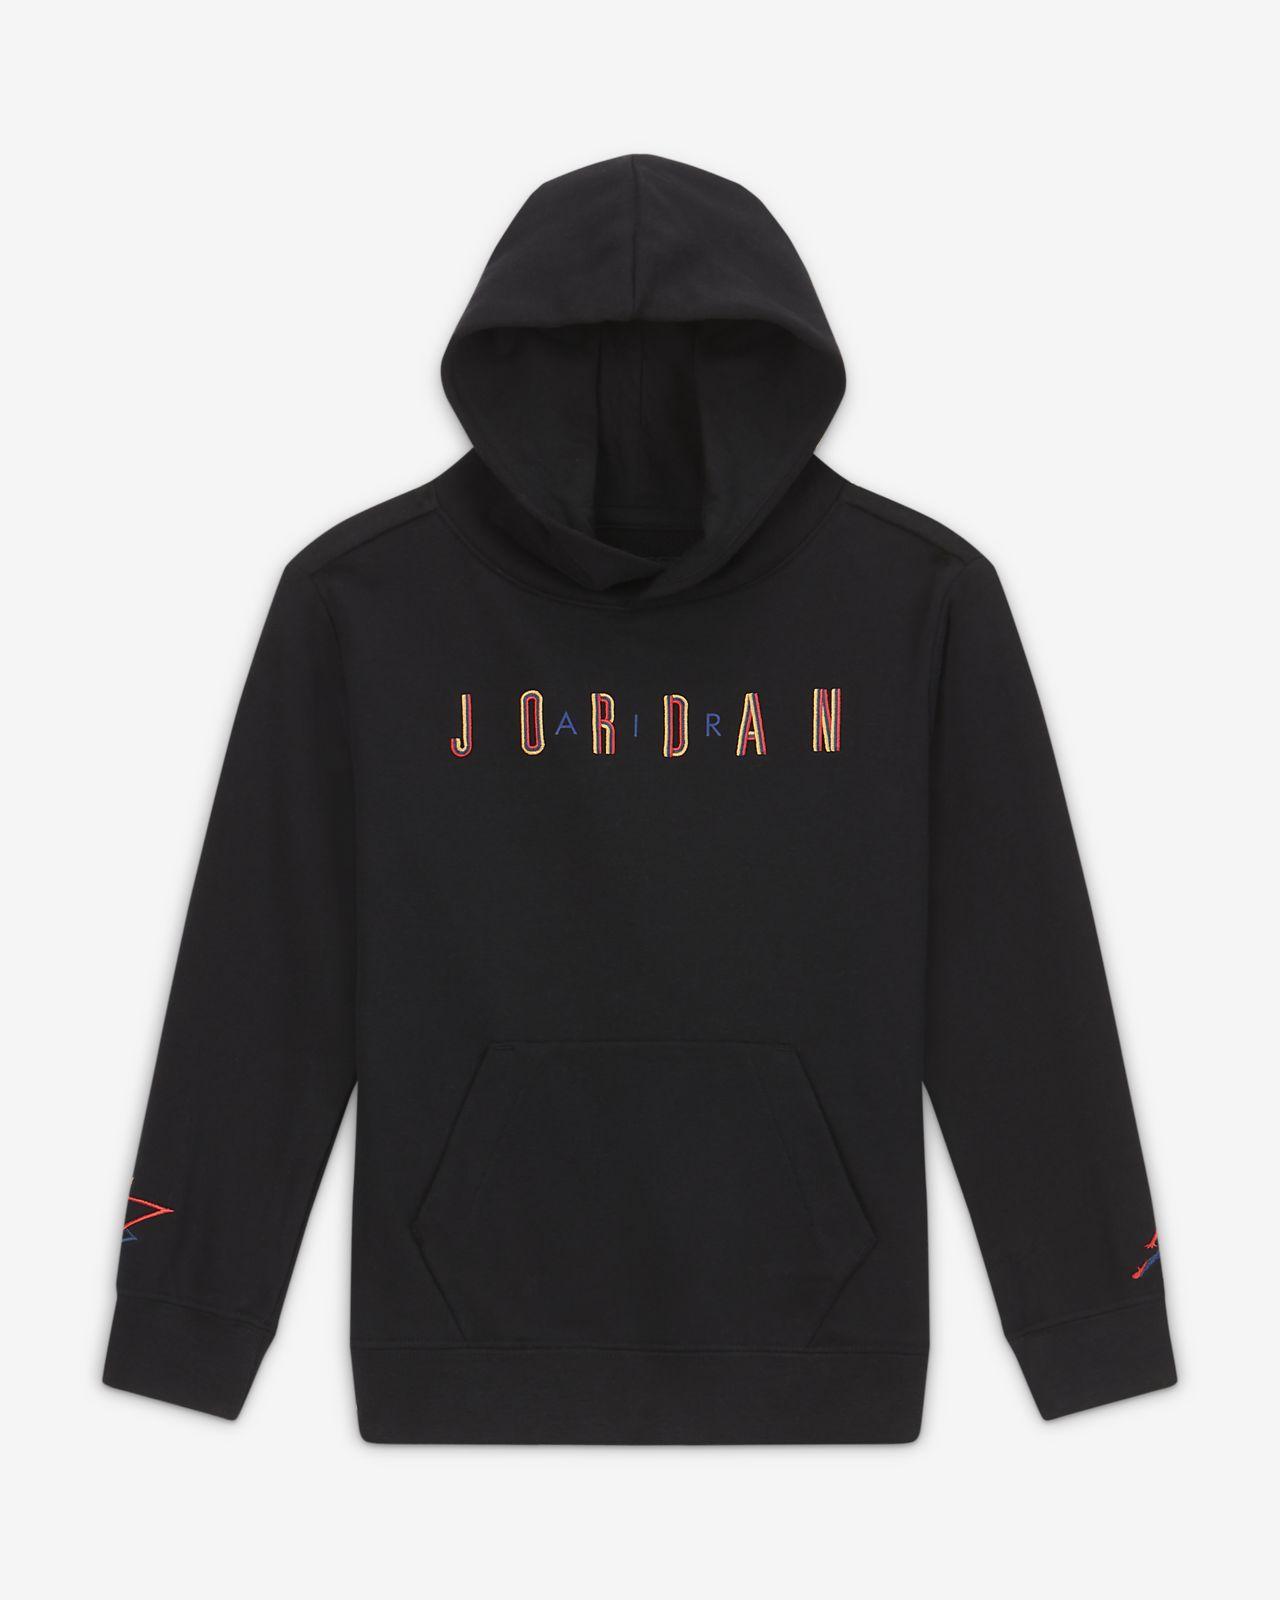 Jordan 幼童连帽衫